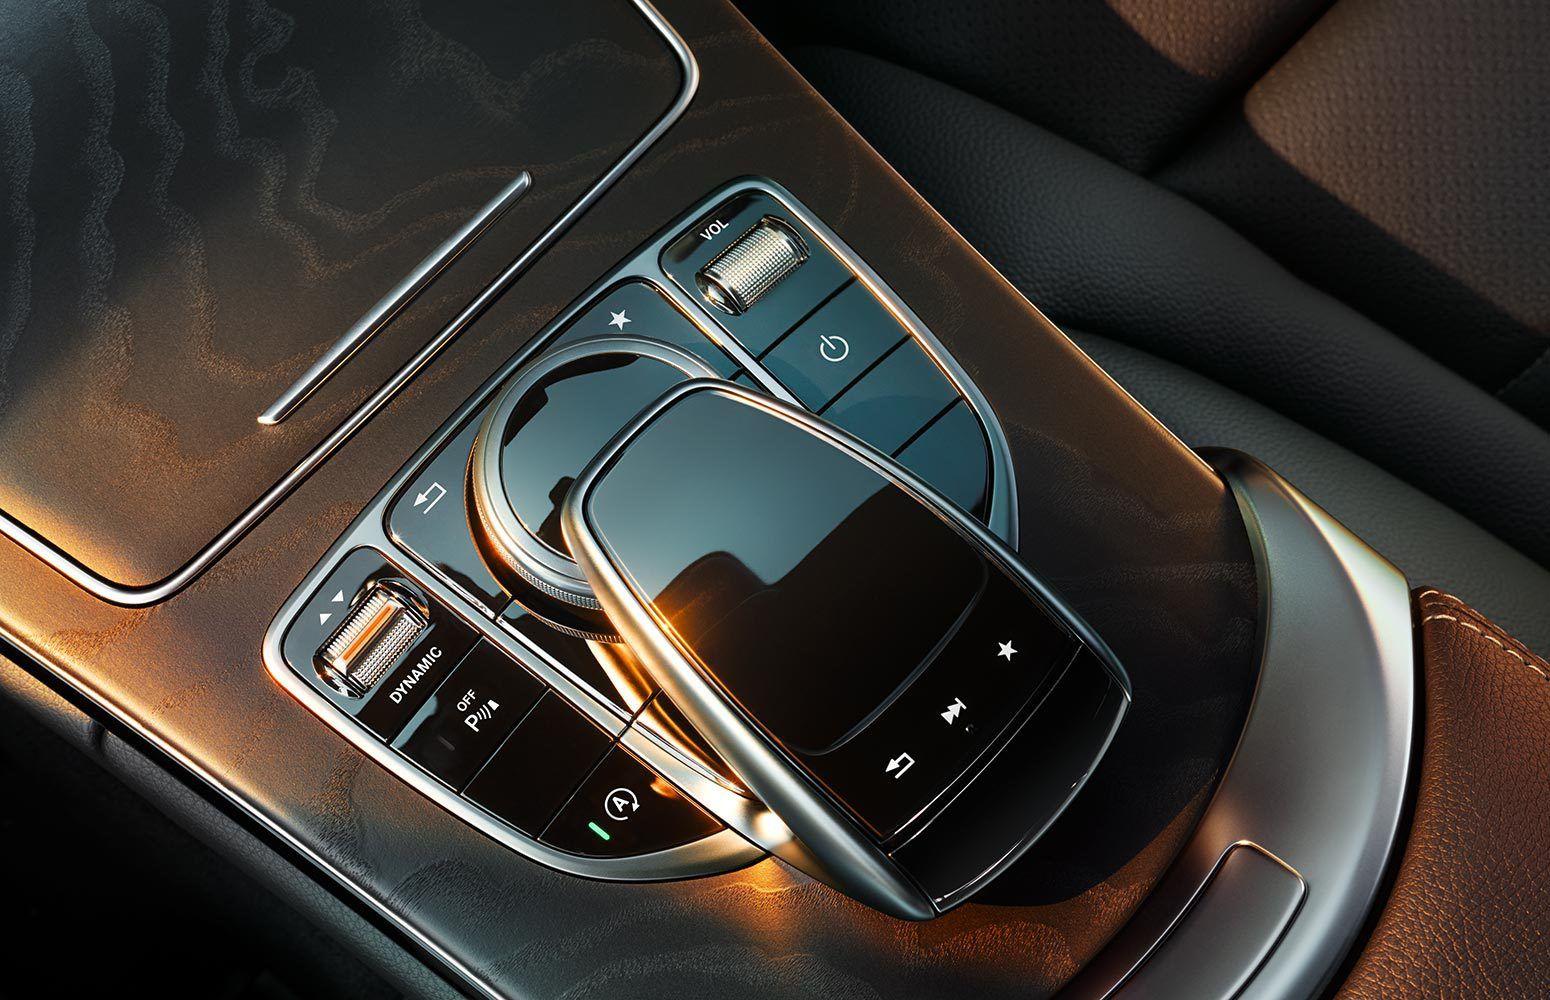 Mercedes Benz C-Class Campaign, FRITHJOF OHM & PRETZSCH